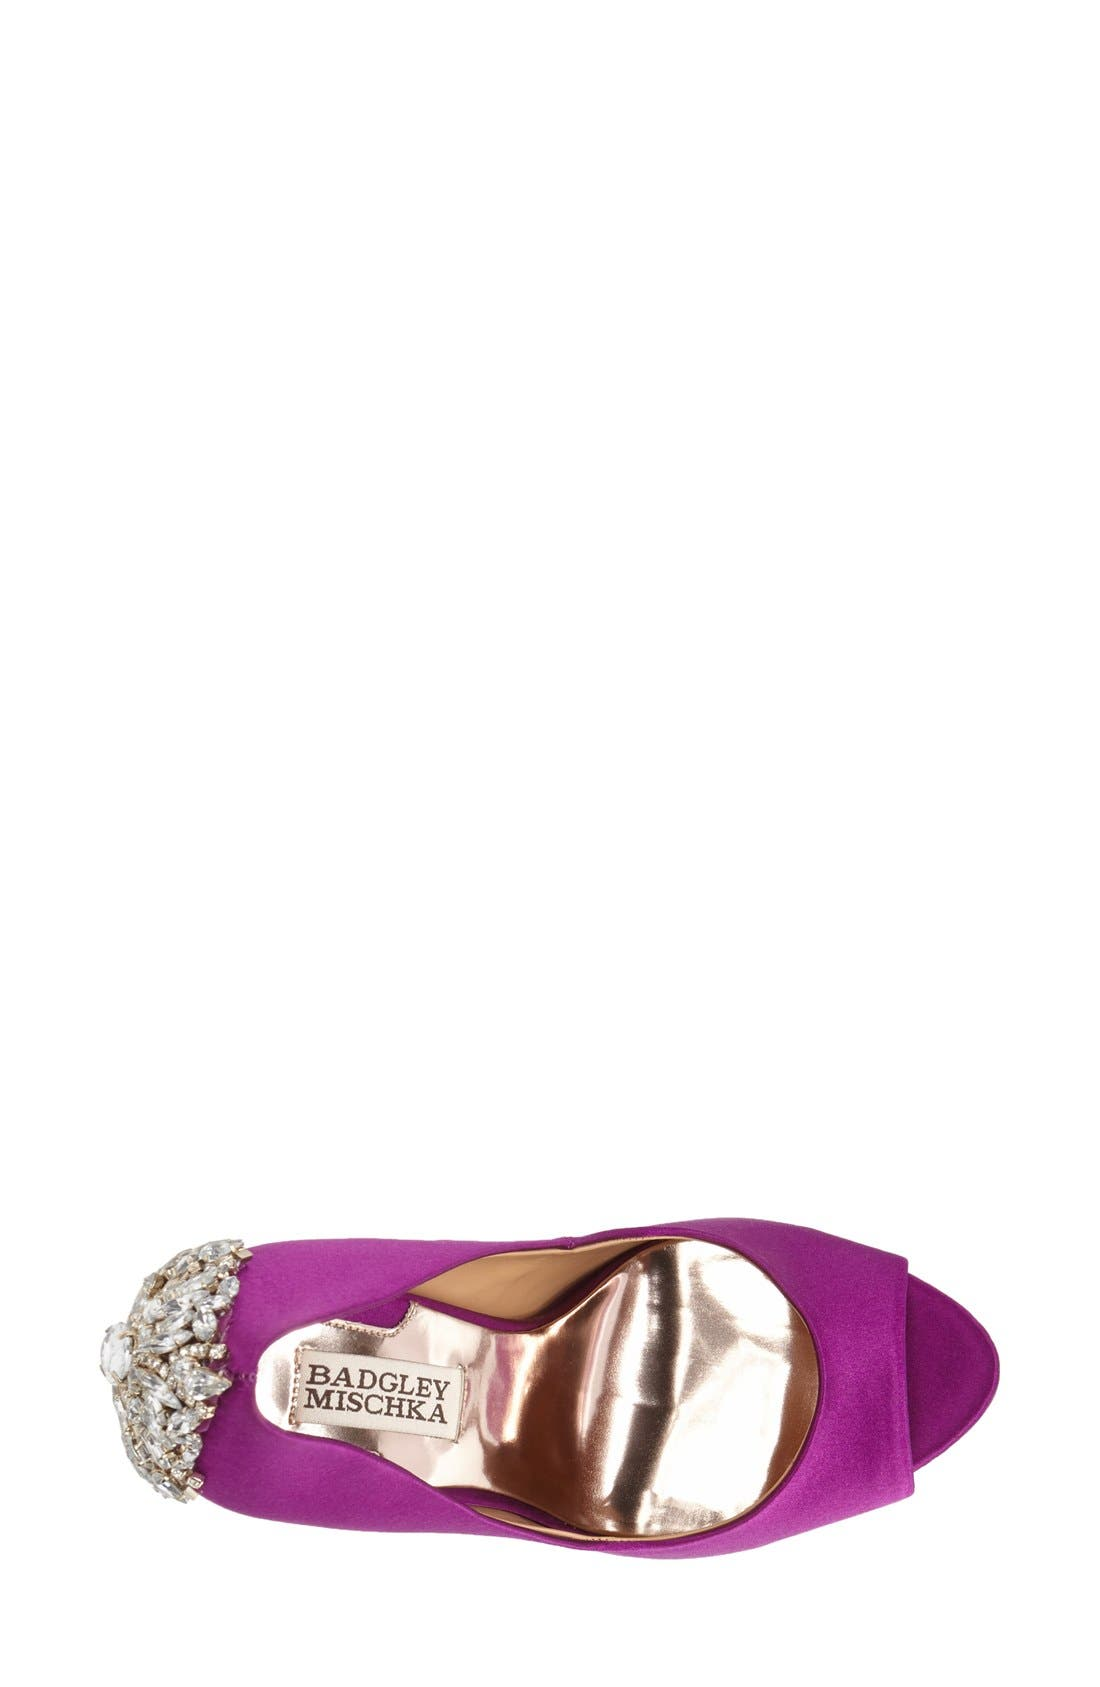 'Kiara' Crystal Back Open Toe Pump,                             Alternate thumbnail 38, color,